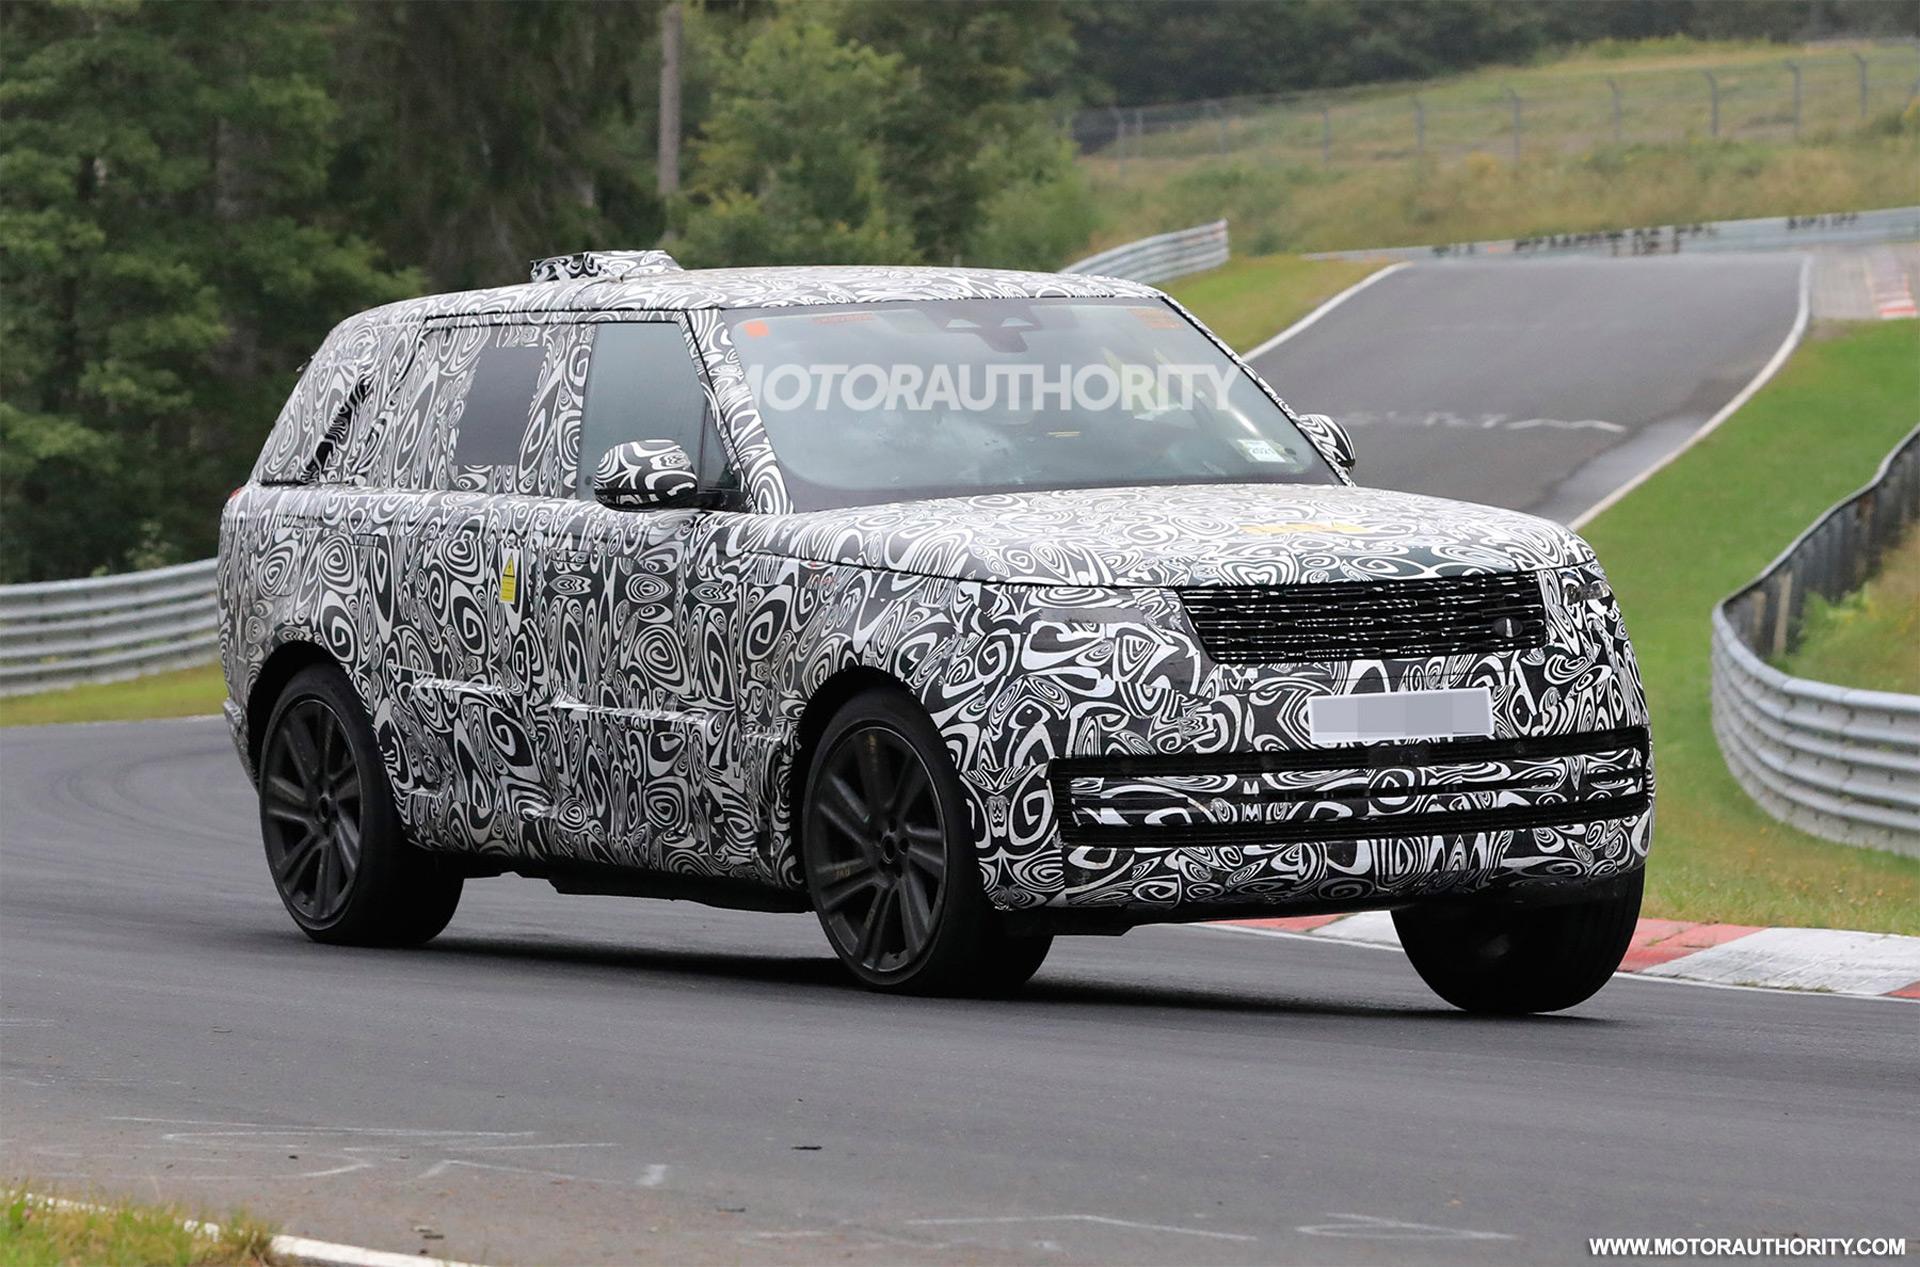 2023 Land Rover Range Rover spy shots and video: Familiar look belies new platform